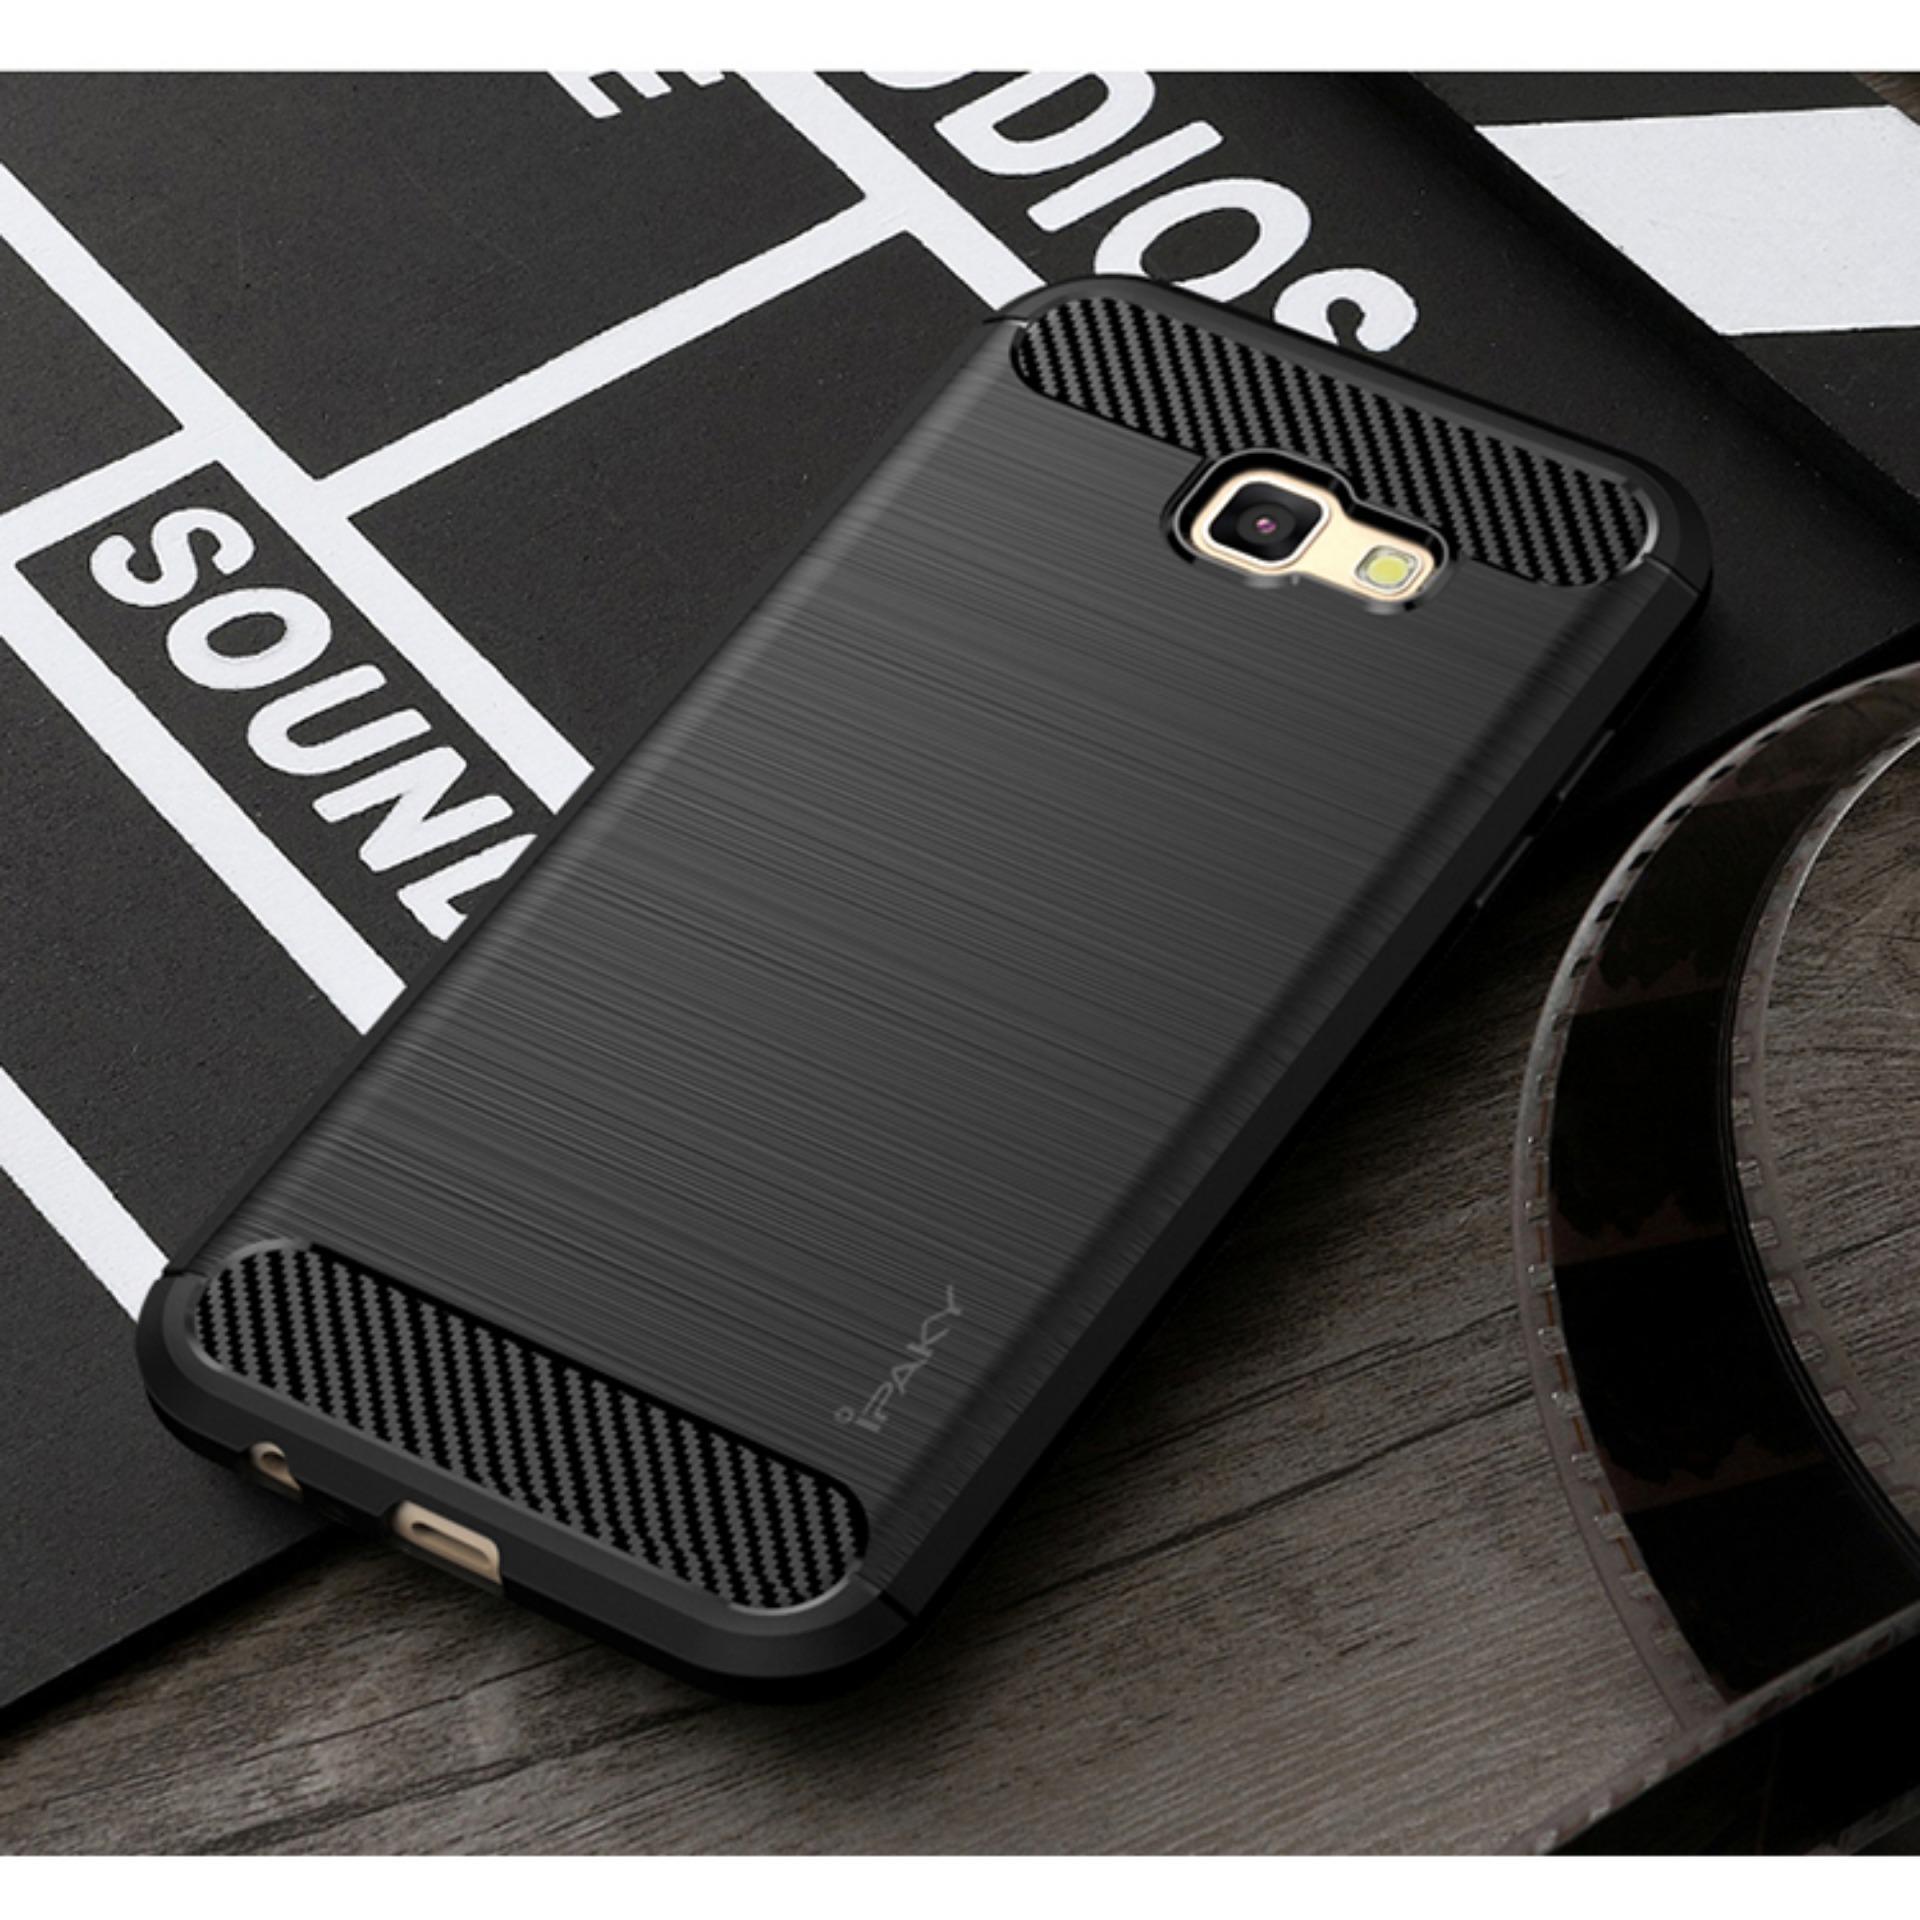 Cek Harga Baru Original Lazada Case Ipaky Shockproof Carbon Hybrid Peonia Samsung J5 Pro 2017 J530 Black Hitam For Galaxy J7 J730